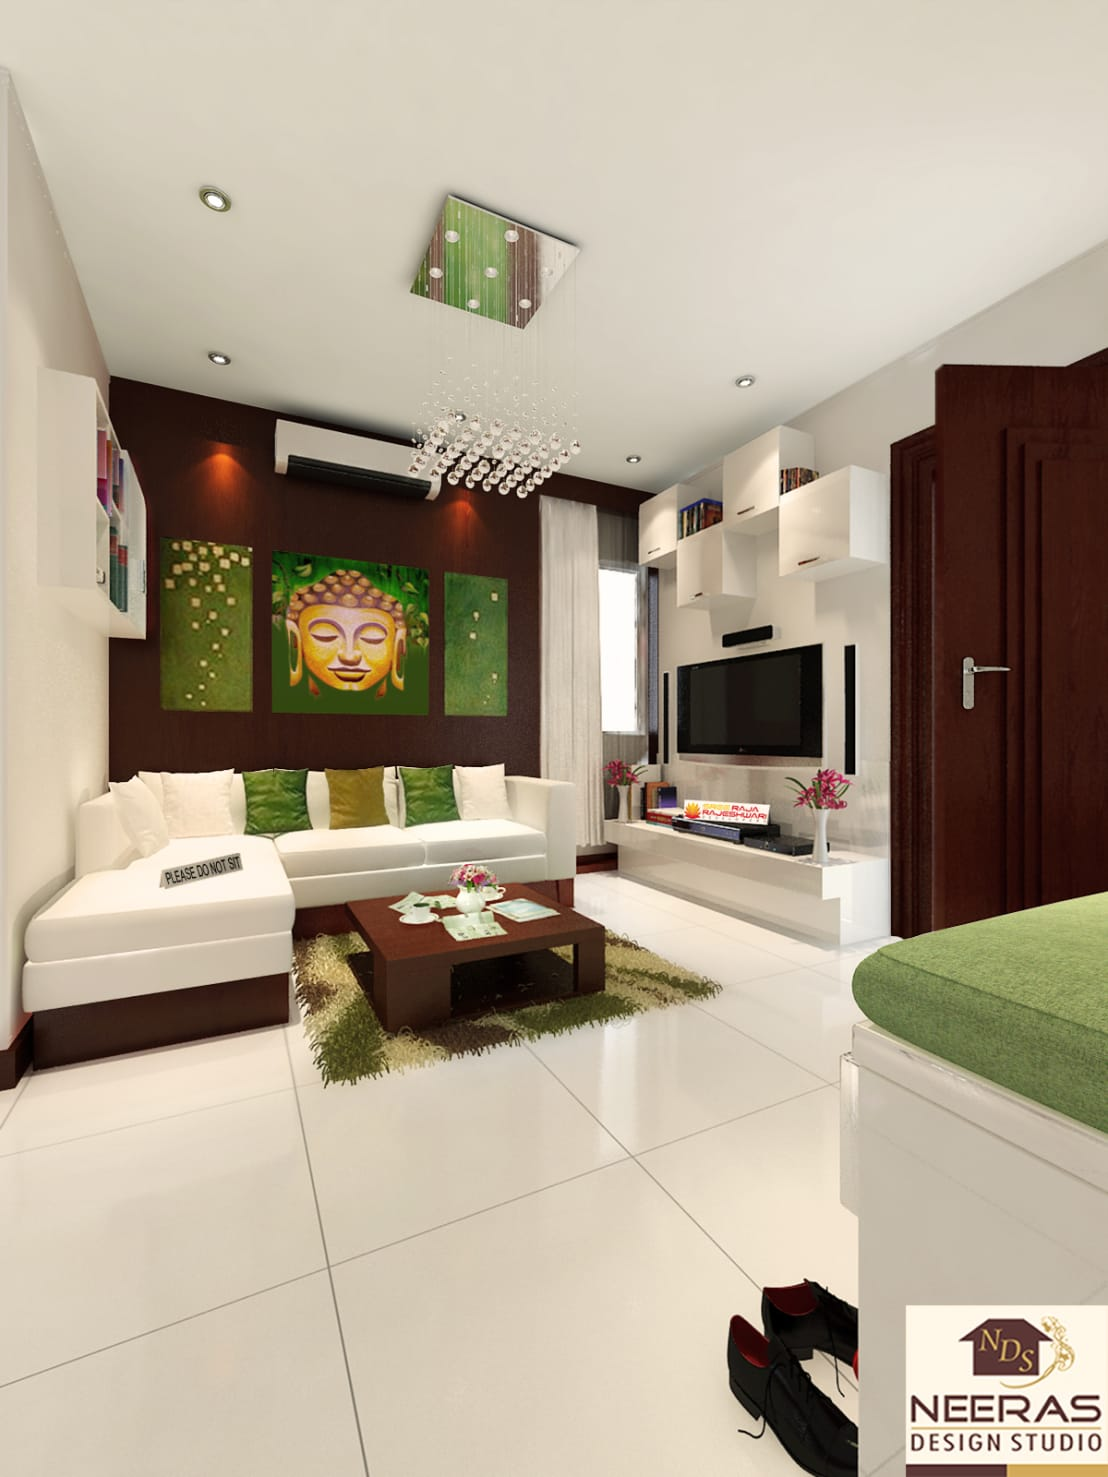 Zen Design And Decorating